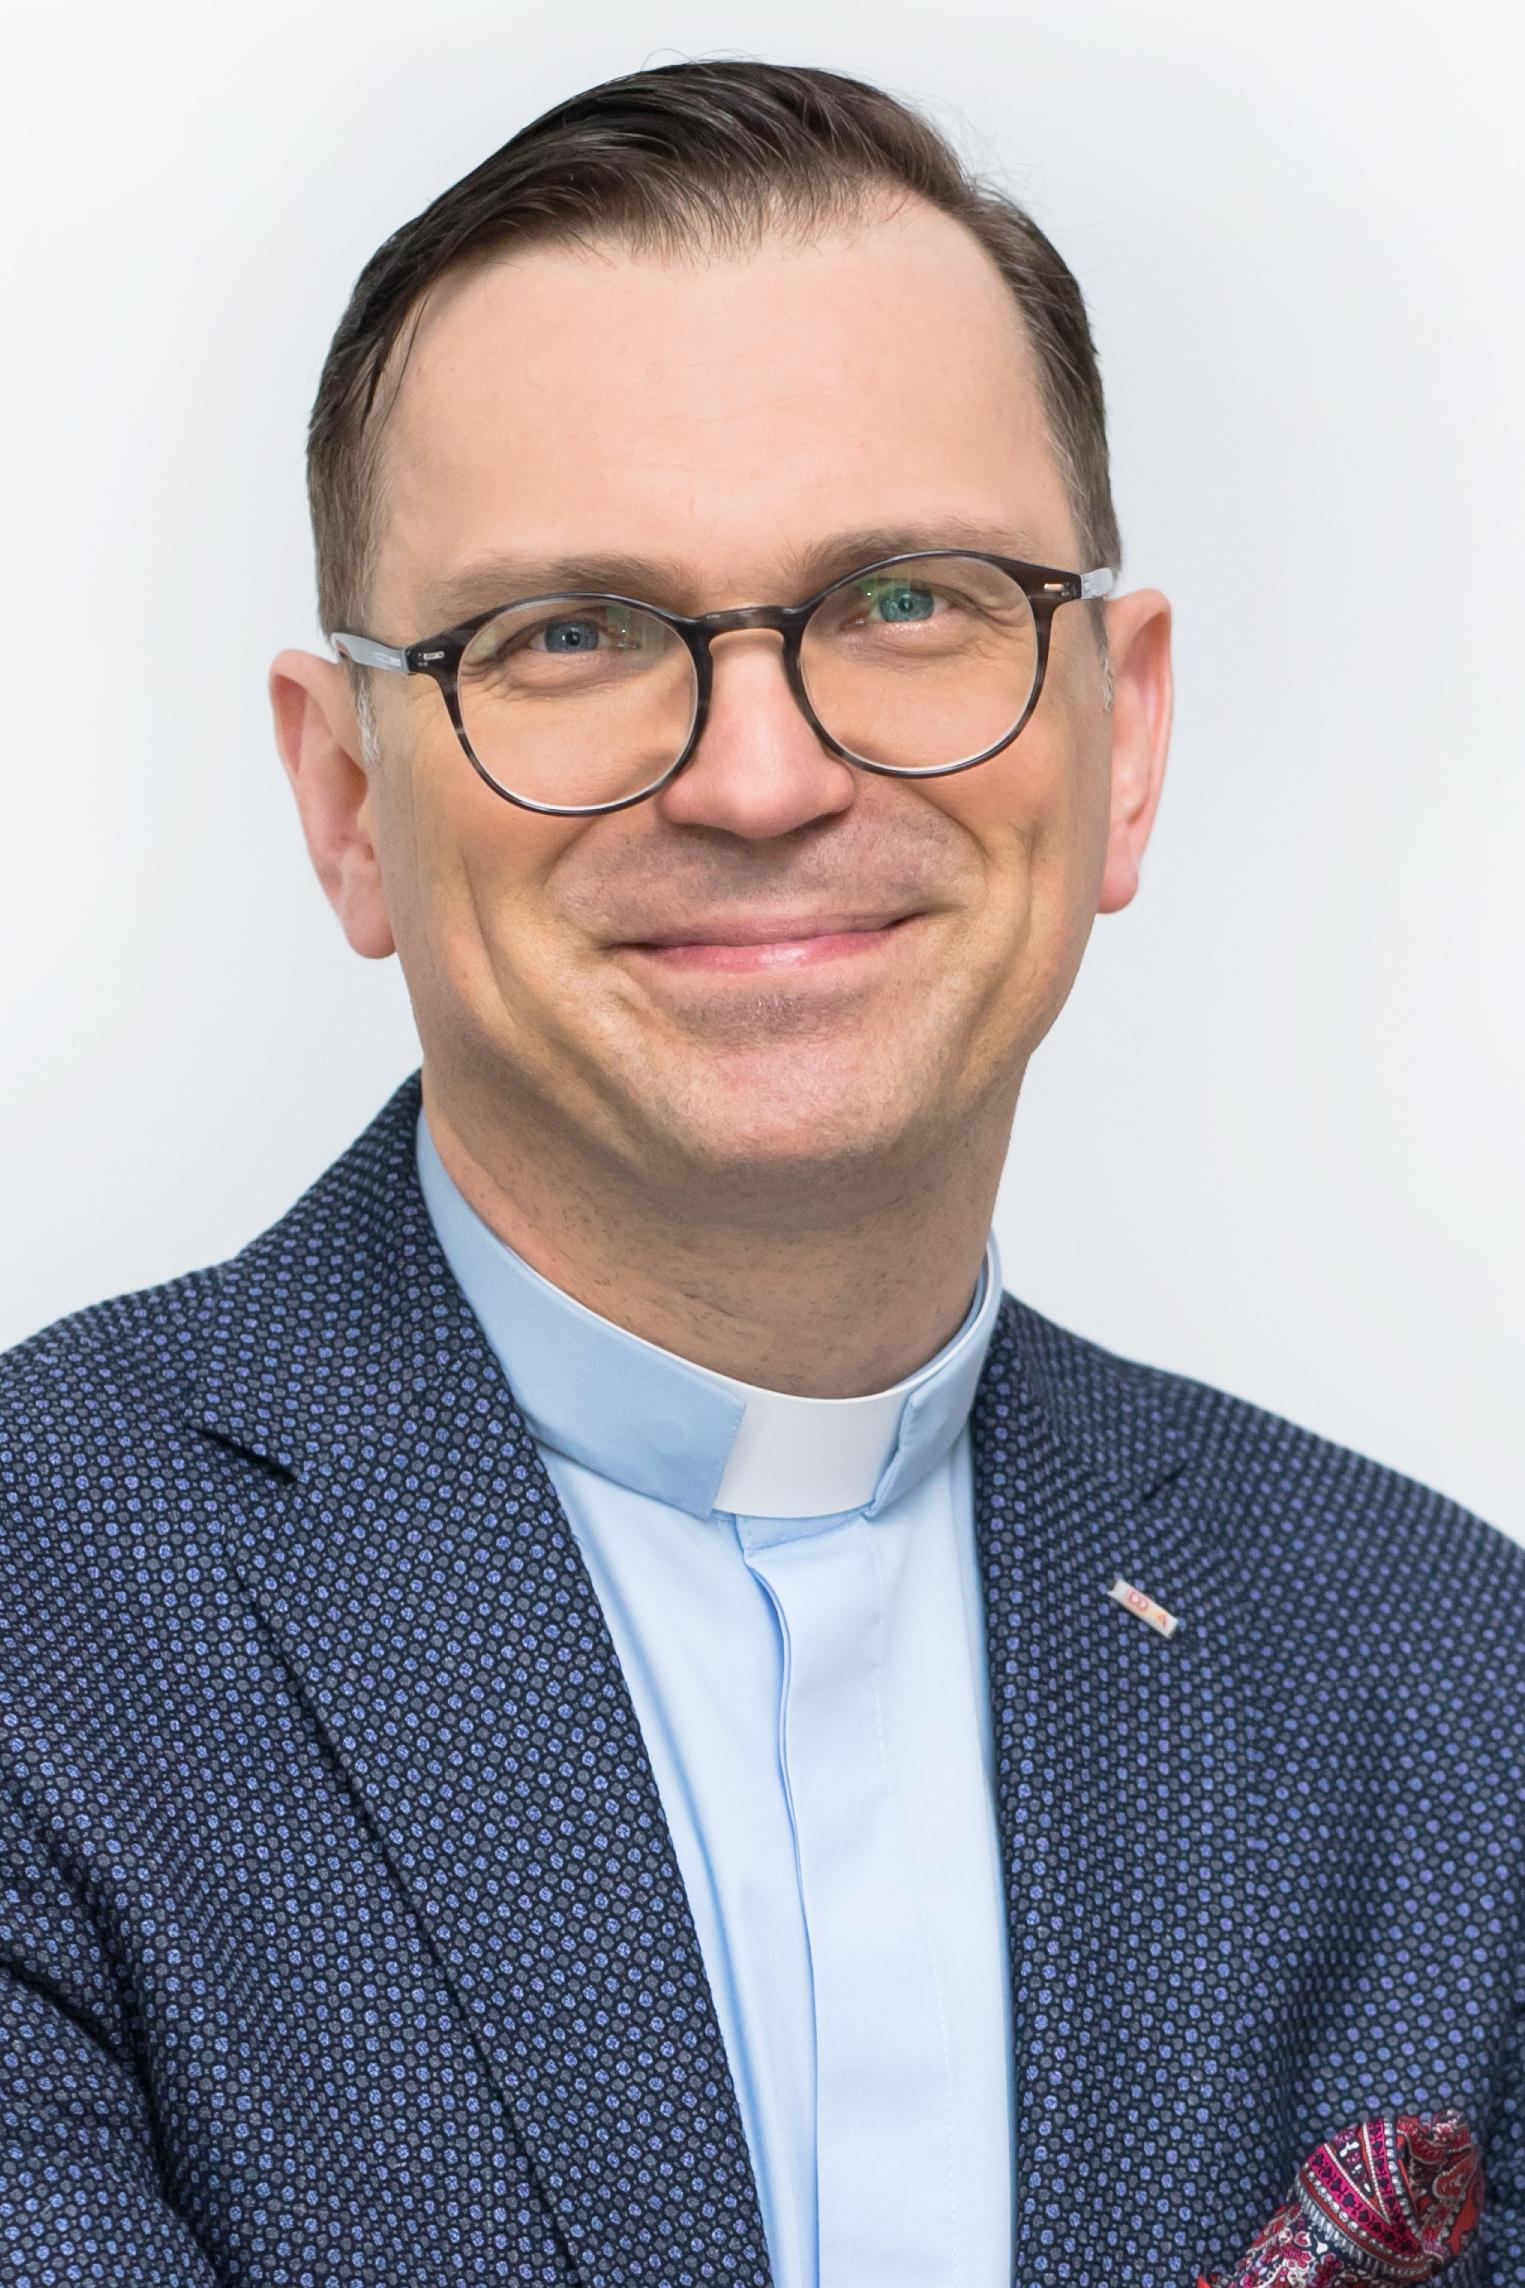 Krzysztof_Faber